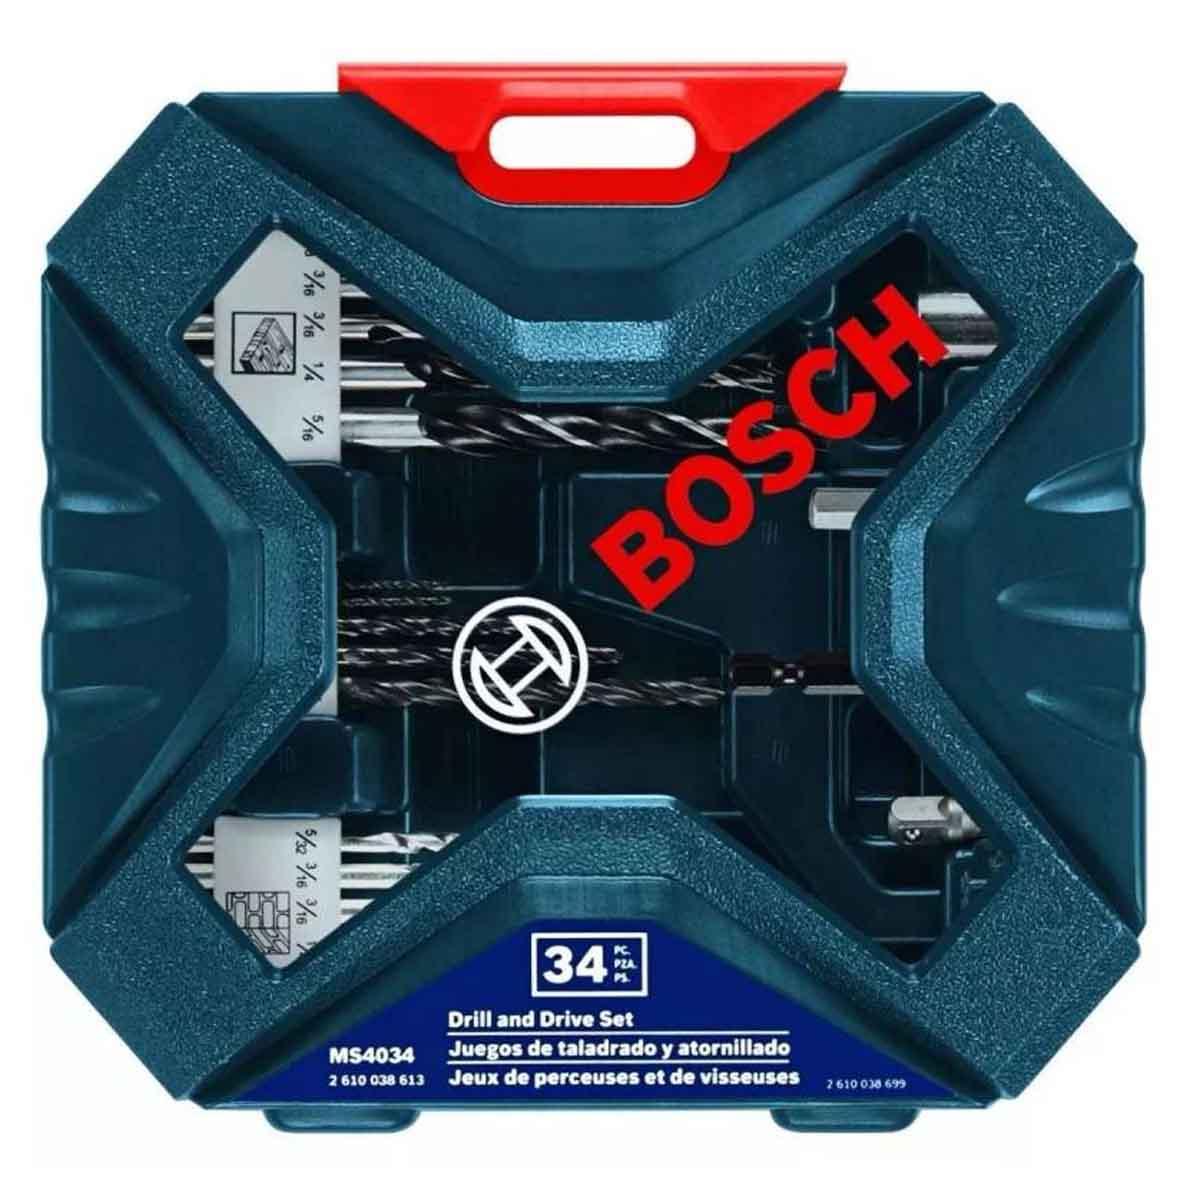 Set Kit Brocas Taladro Ideal En Metal X-line 34 Pzas Bosch